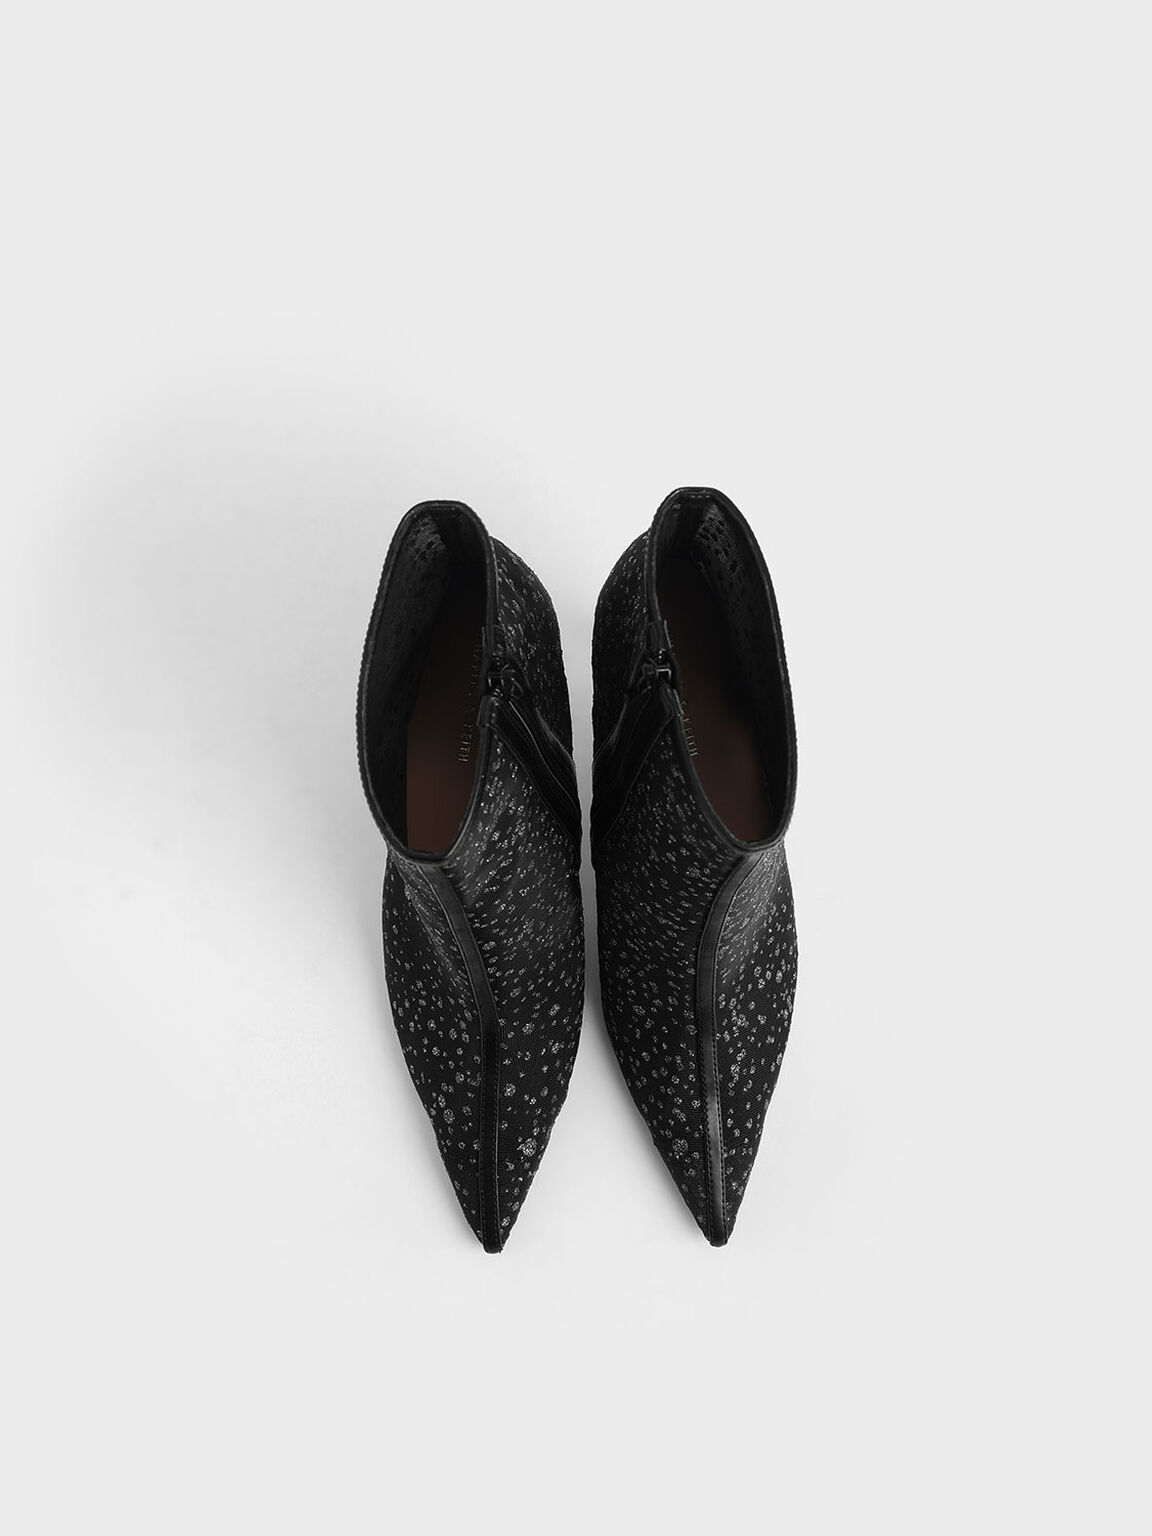 Mesh Stiletto Ankle Boots, Black Textured, hi-res